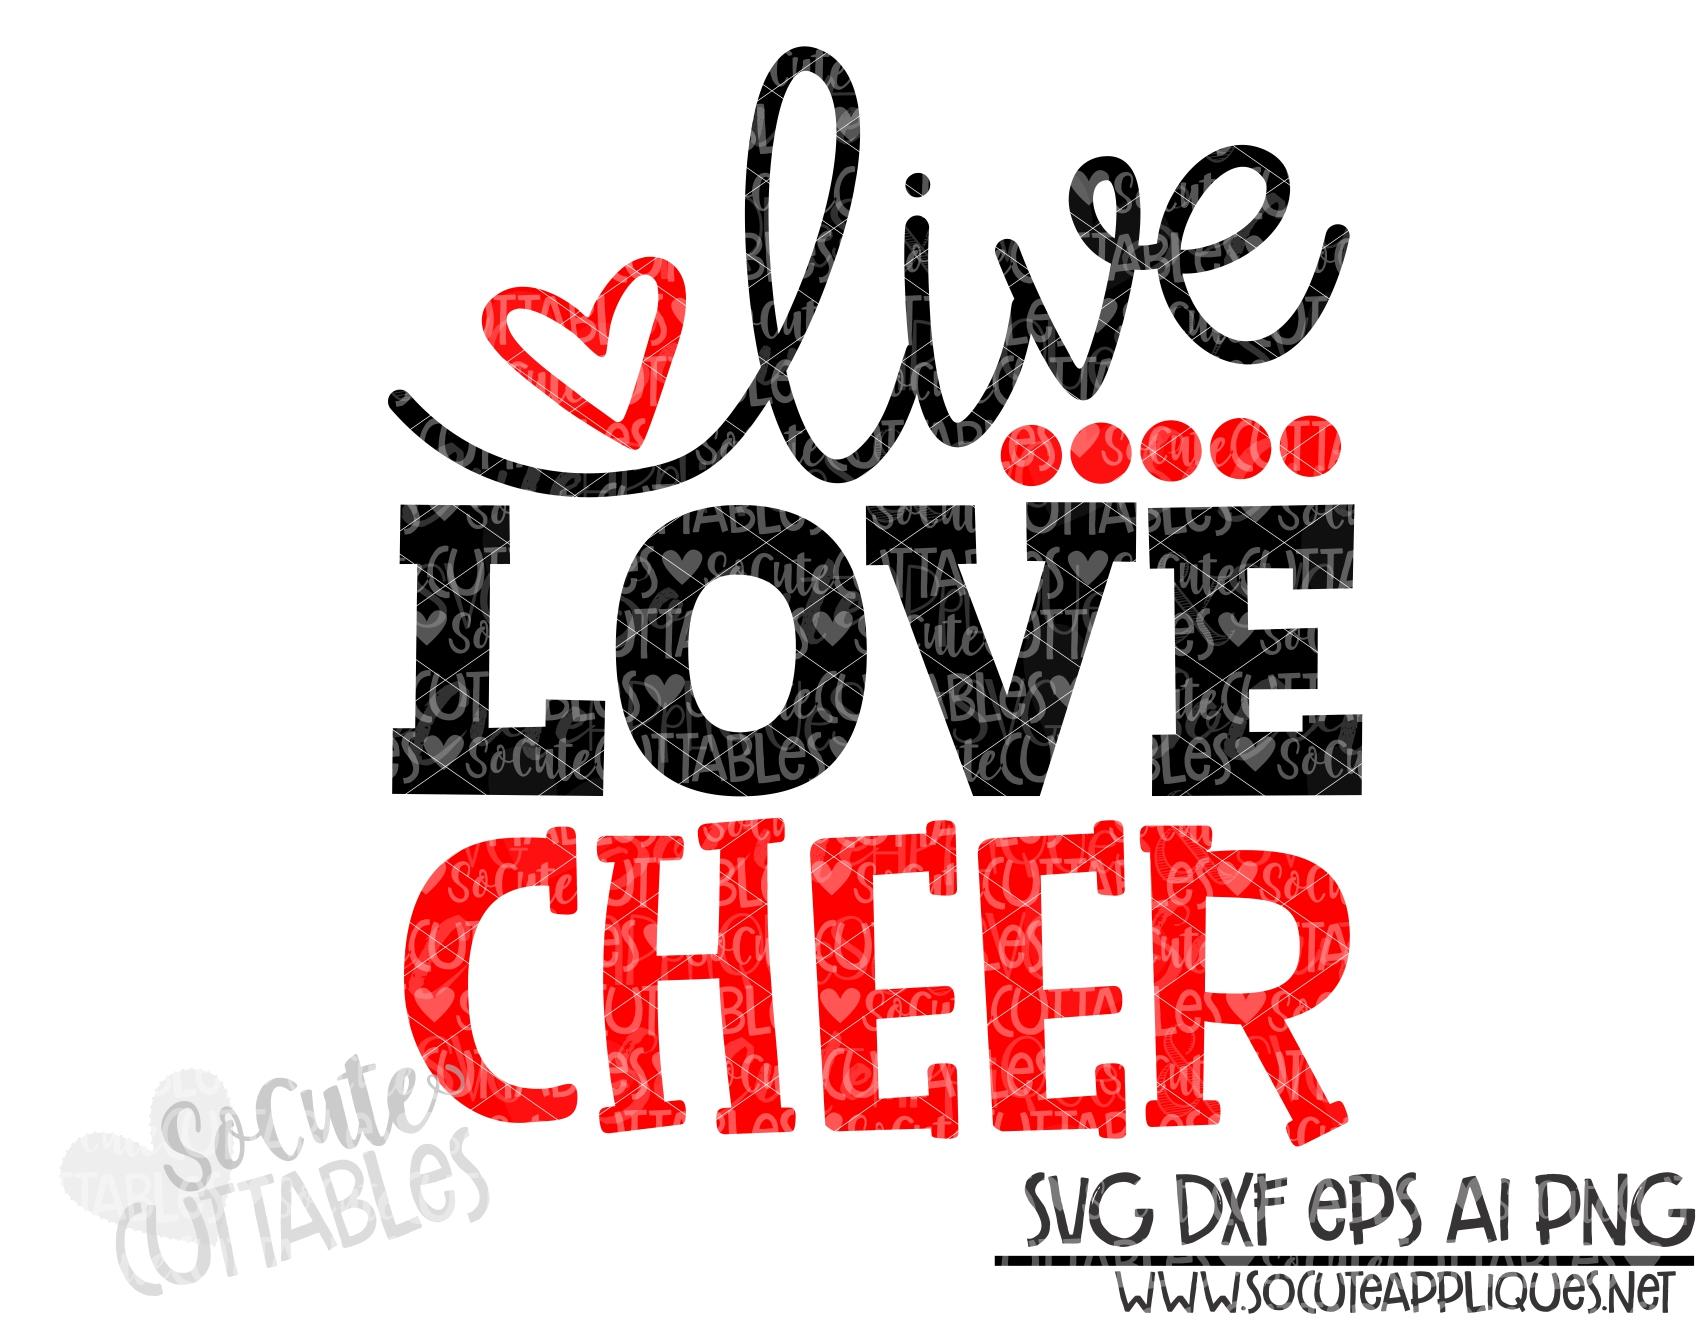 Download Live love Cheer svg scc 19 - socuteappliques.net